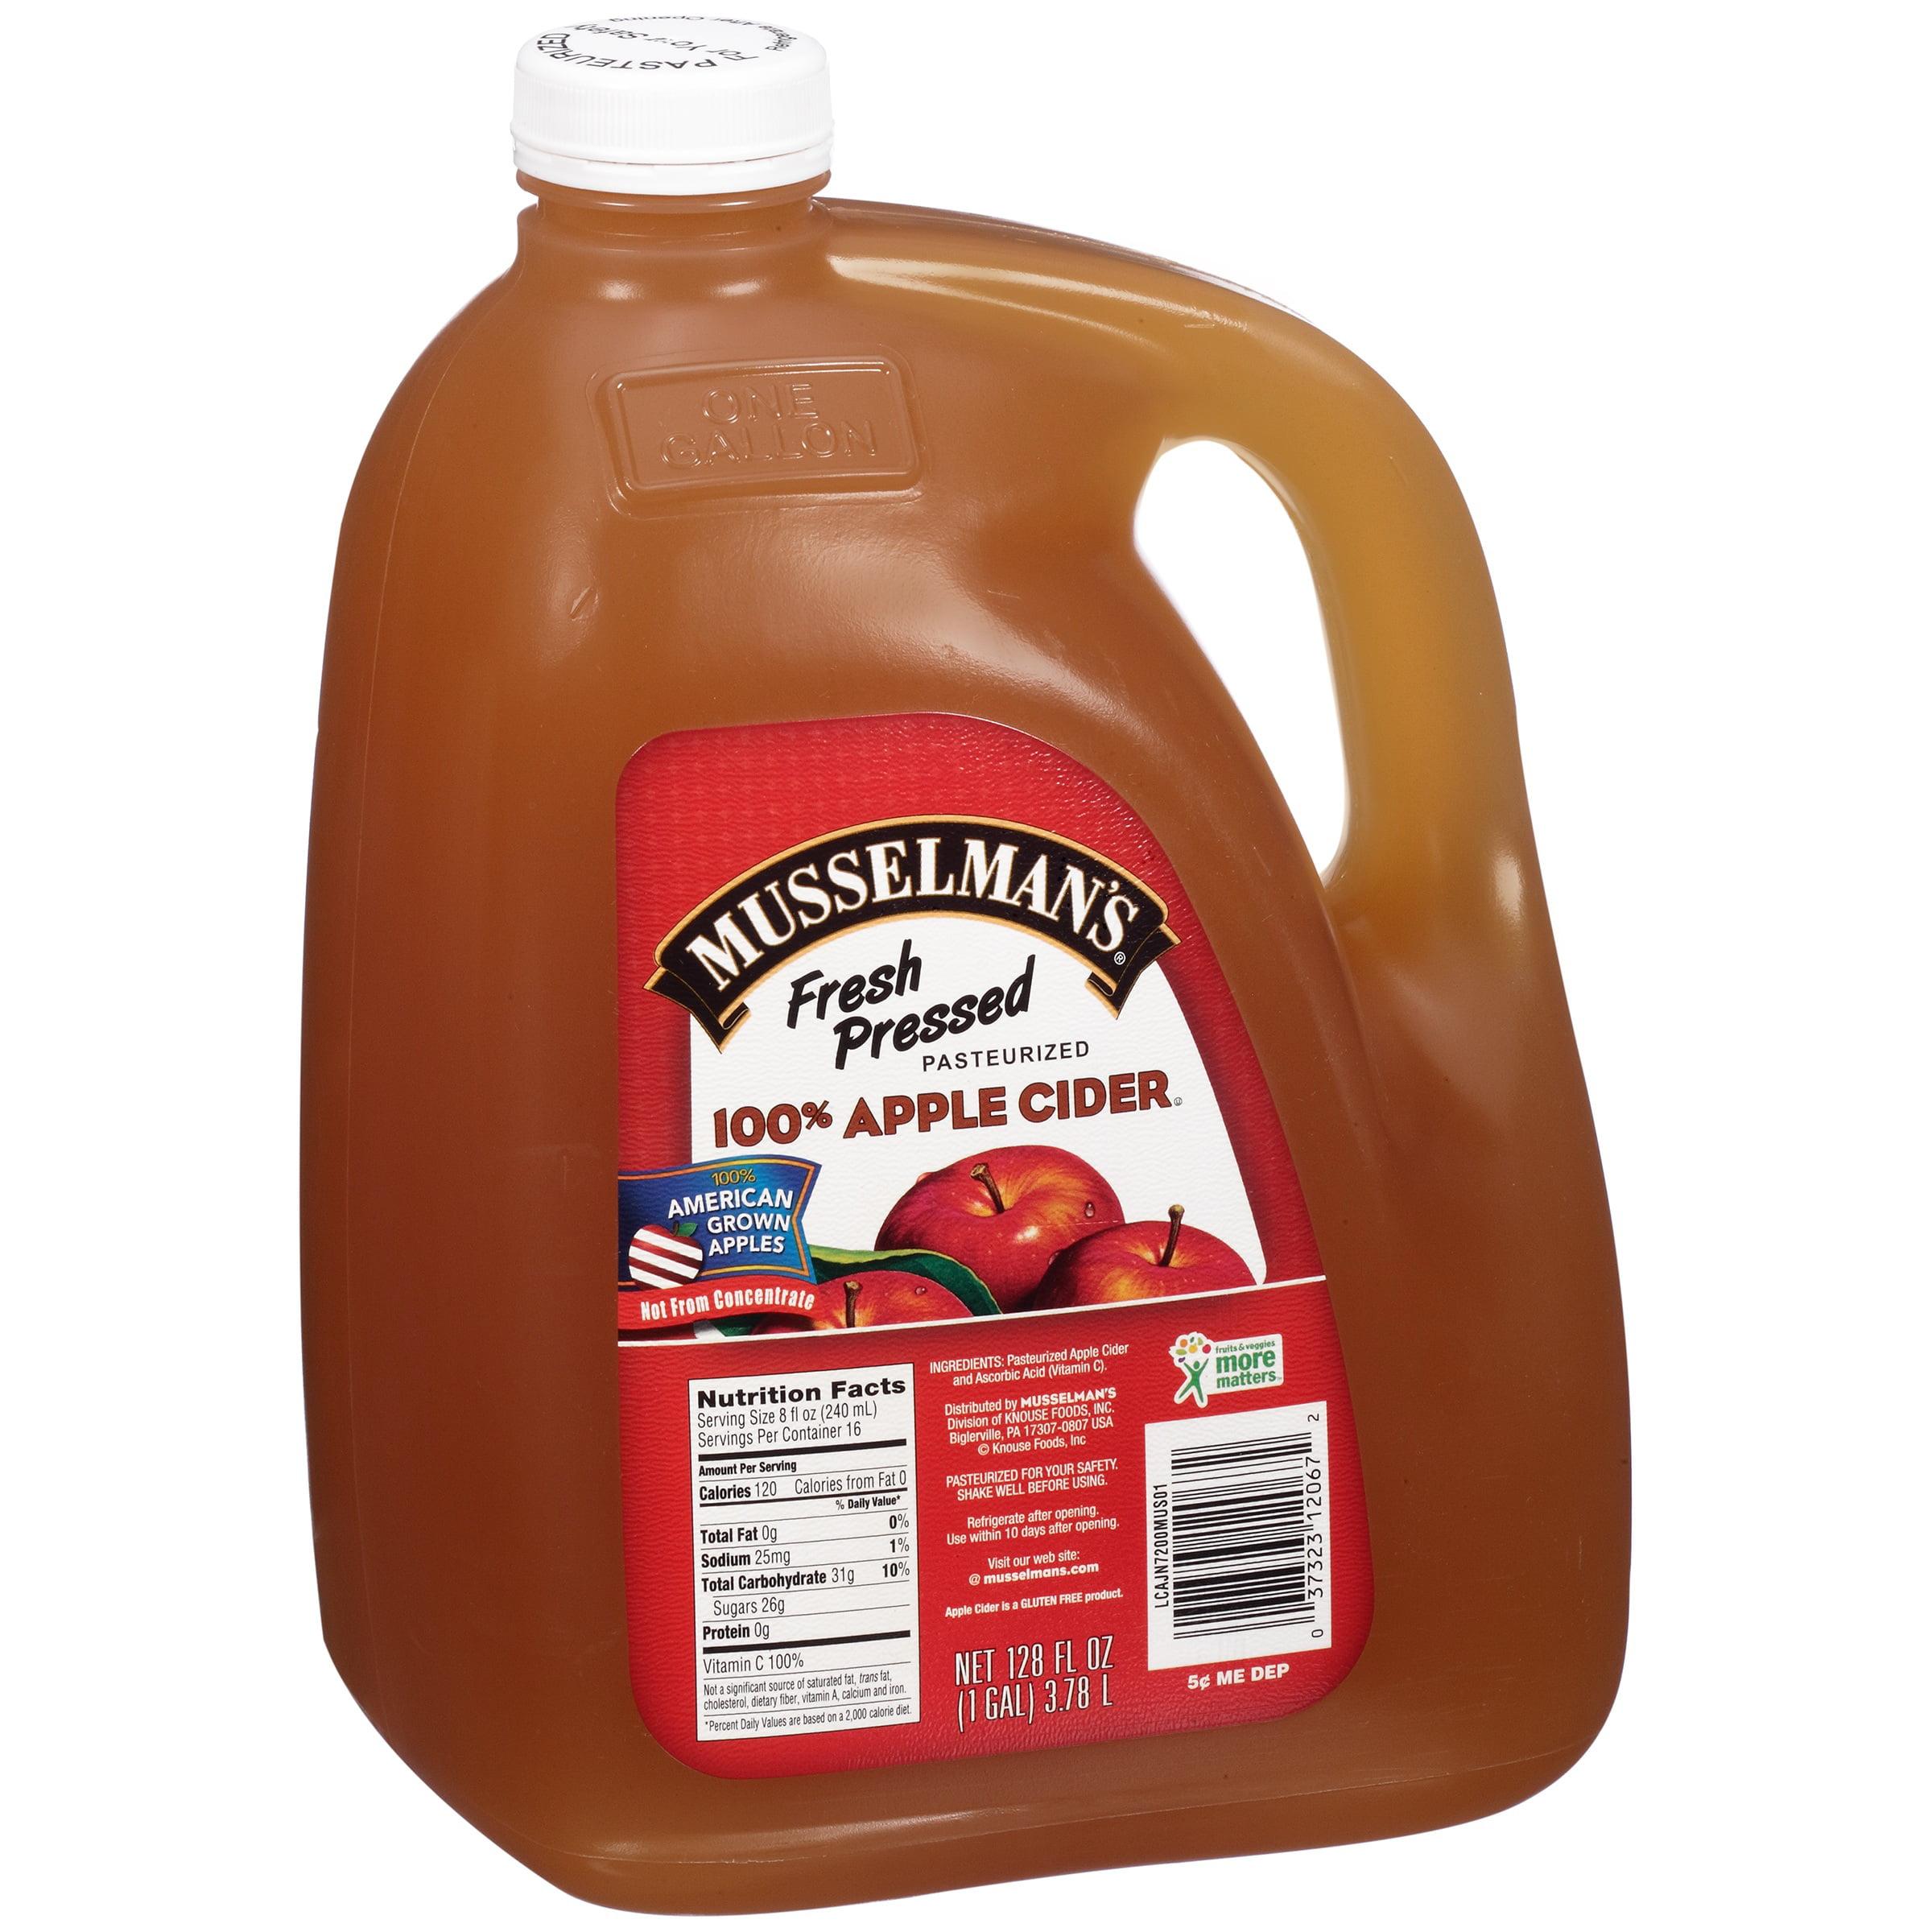 Musselman's, Division Of Knouse Foods, Inc. Musselman's � 100% Apple Cider 128 Fl. Oz. Jug